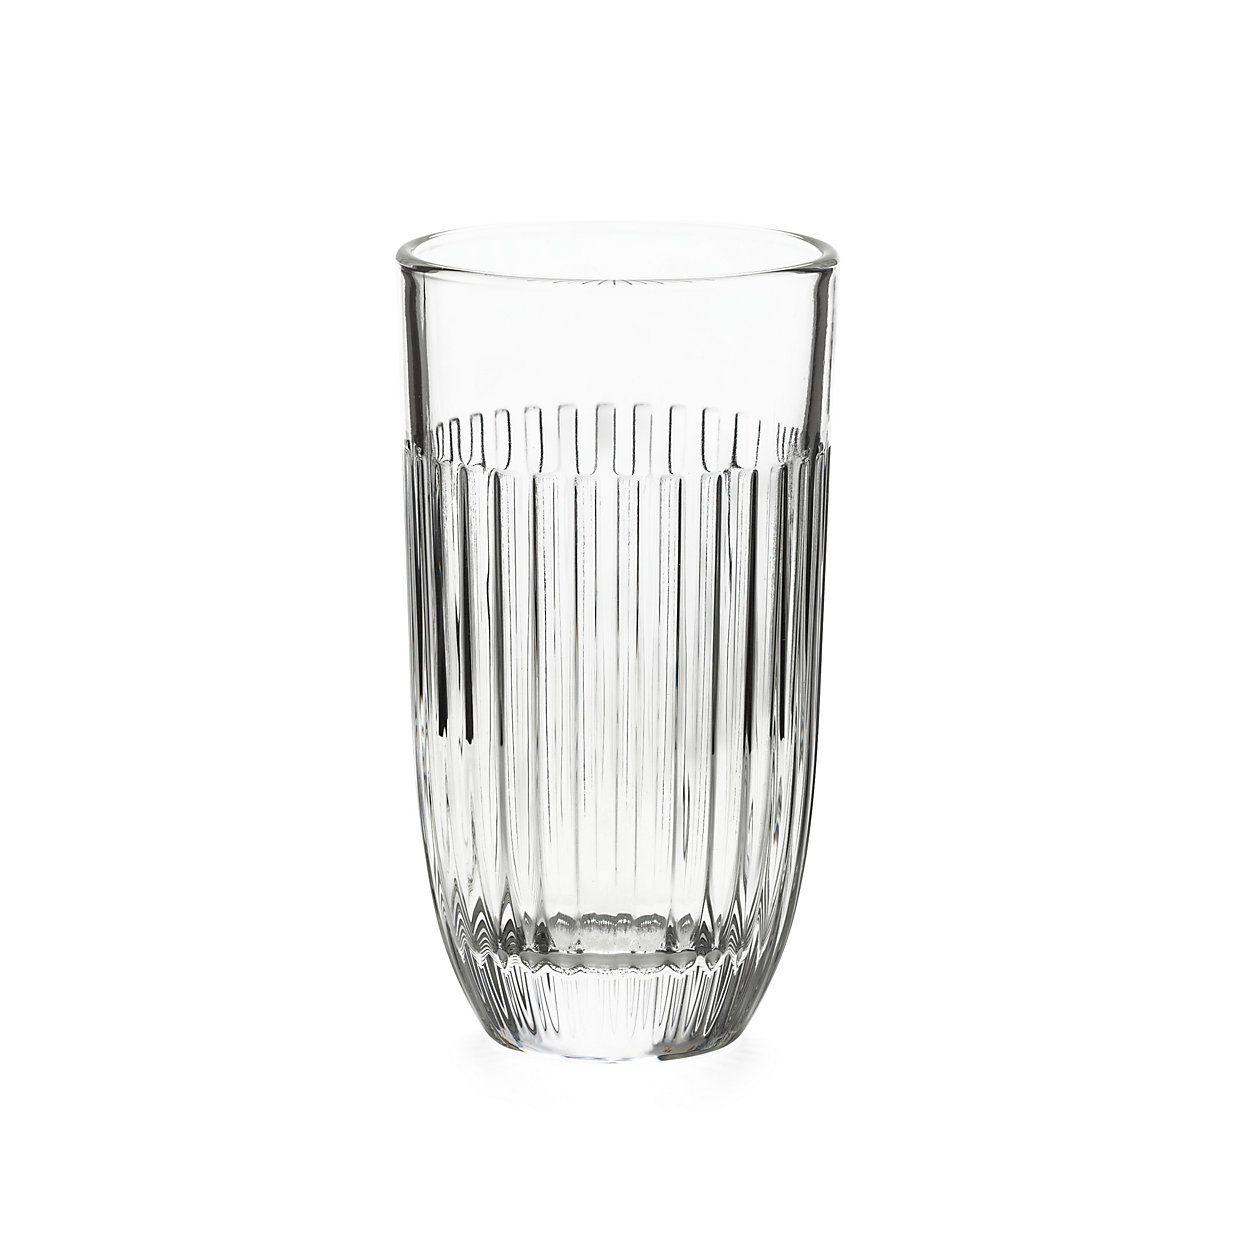 La Rochere Longdrinkglas Ouessant Manufactum Manufactum Becher Glas